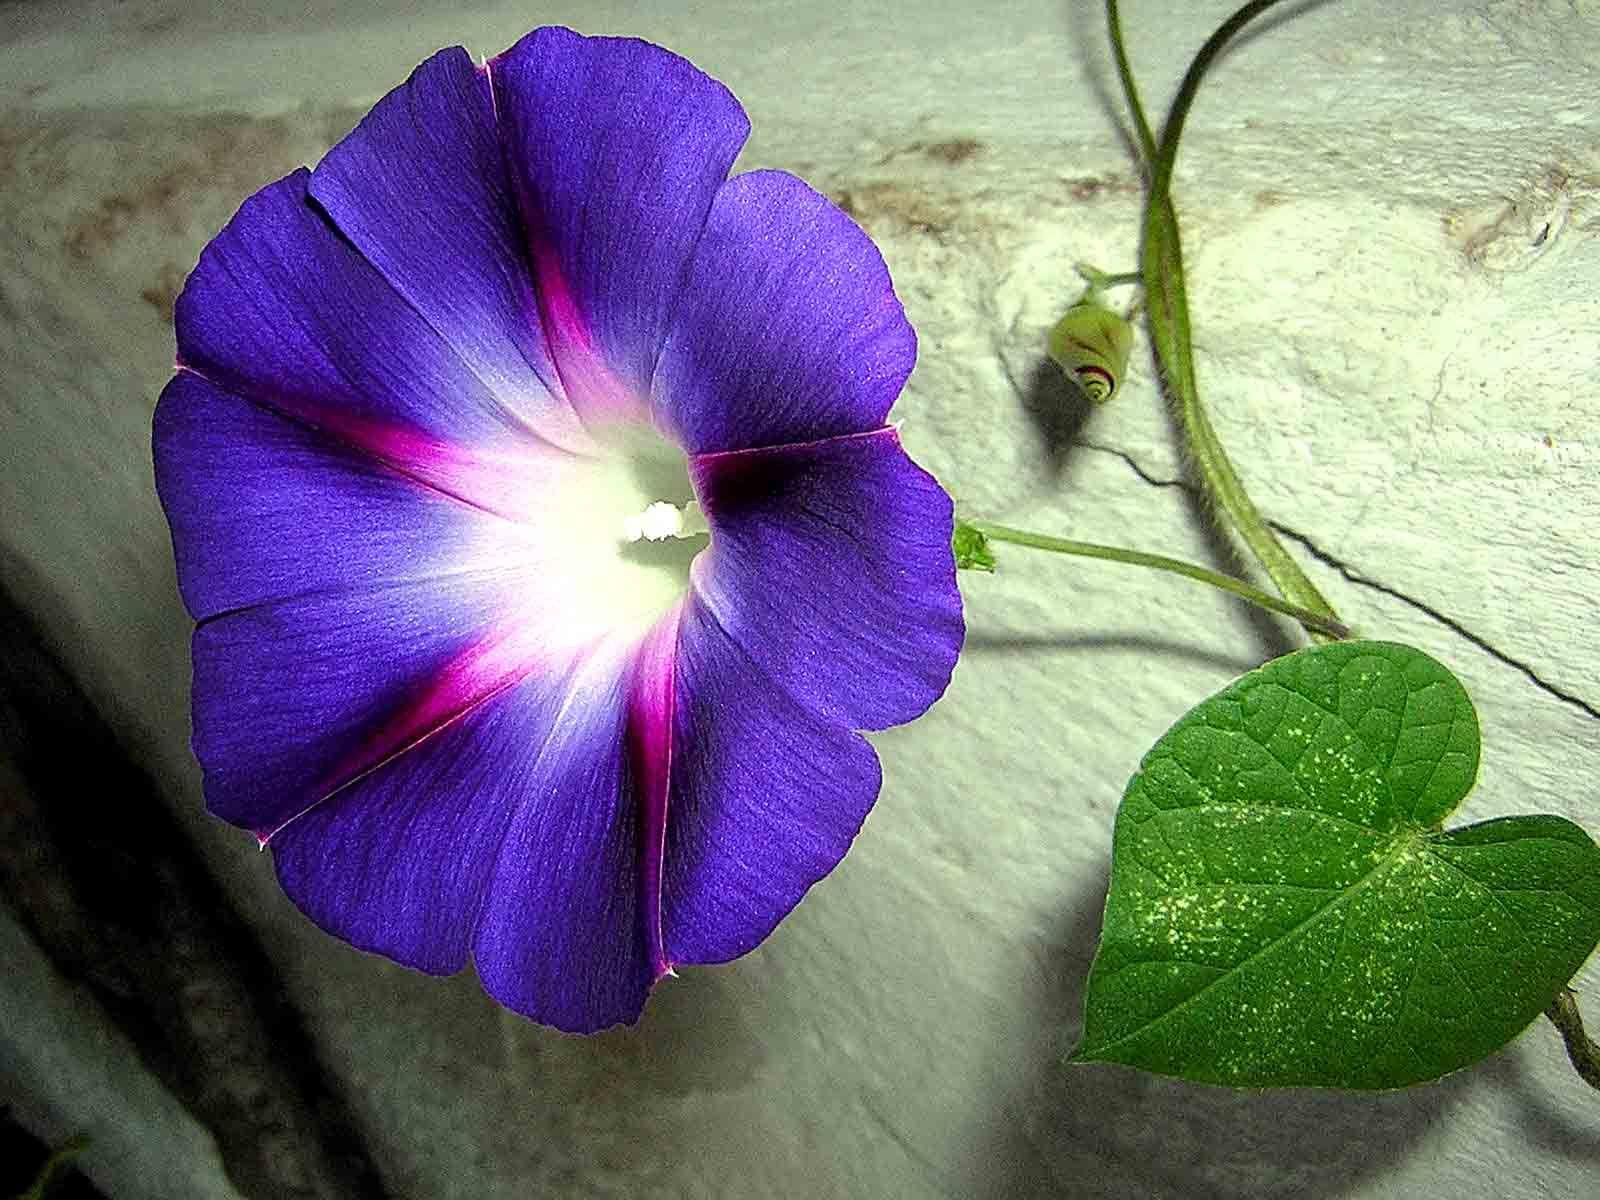 ipomoea morning glory Morning glory flowers, Morning